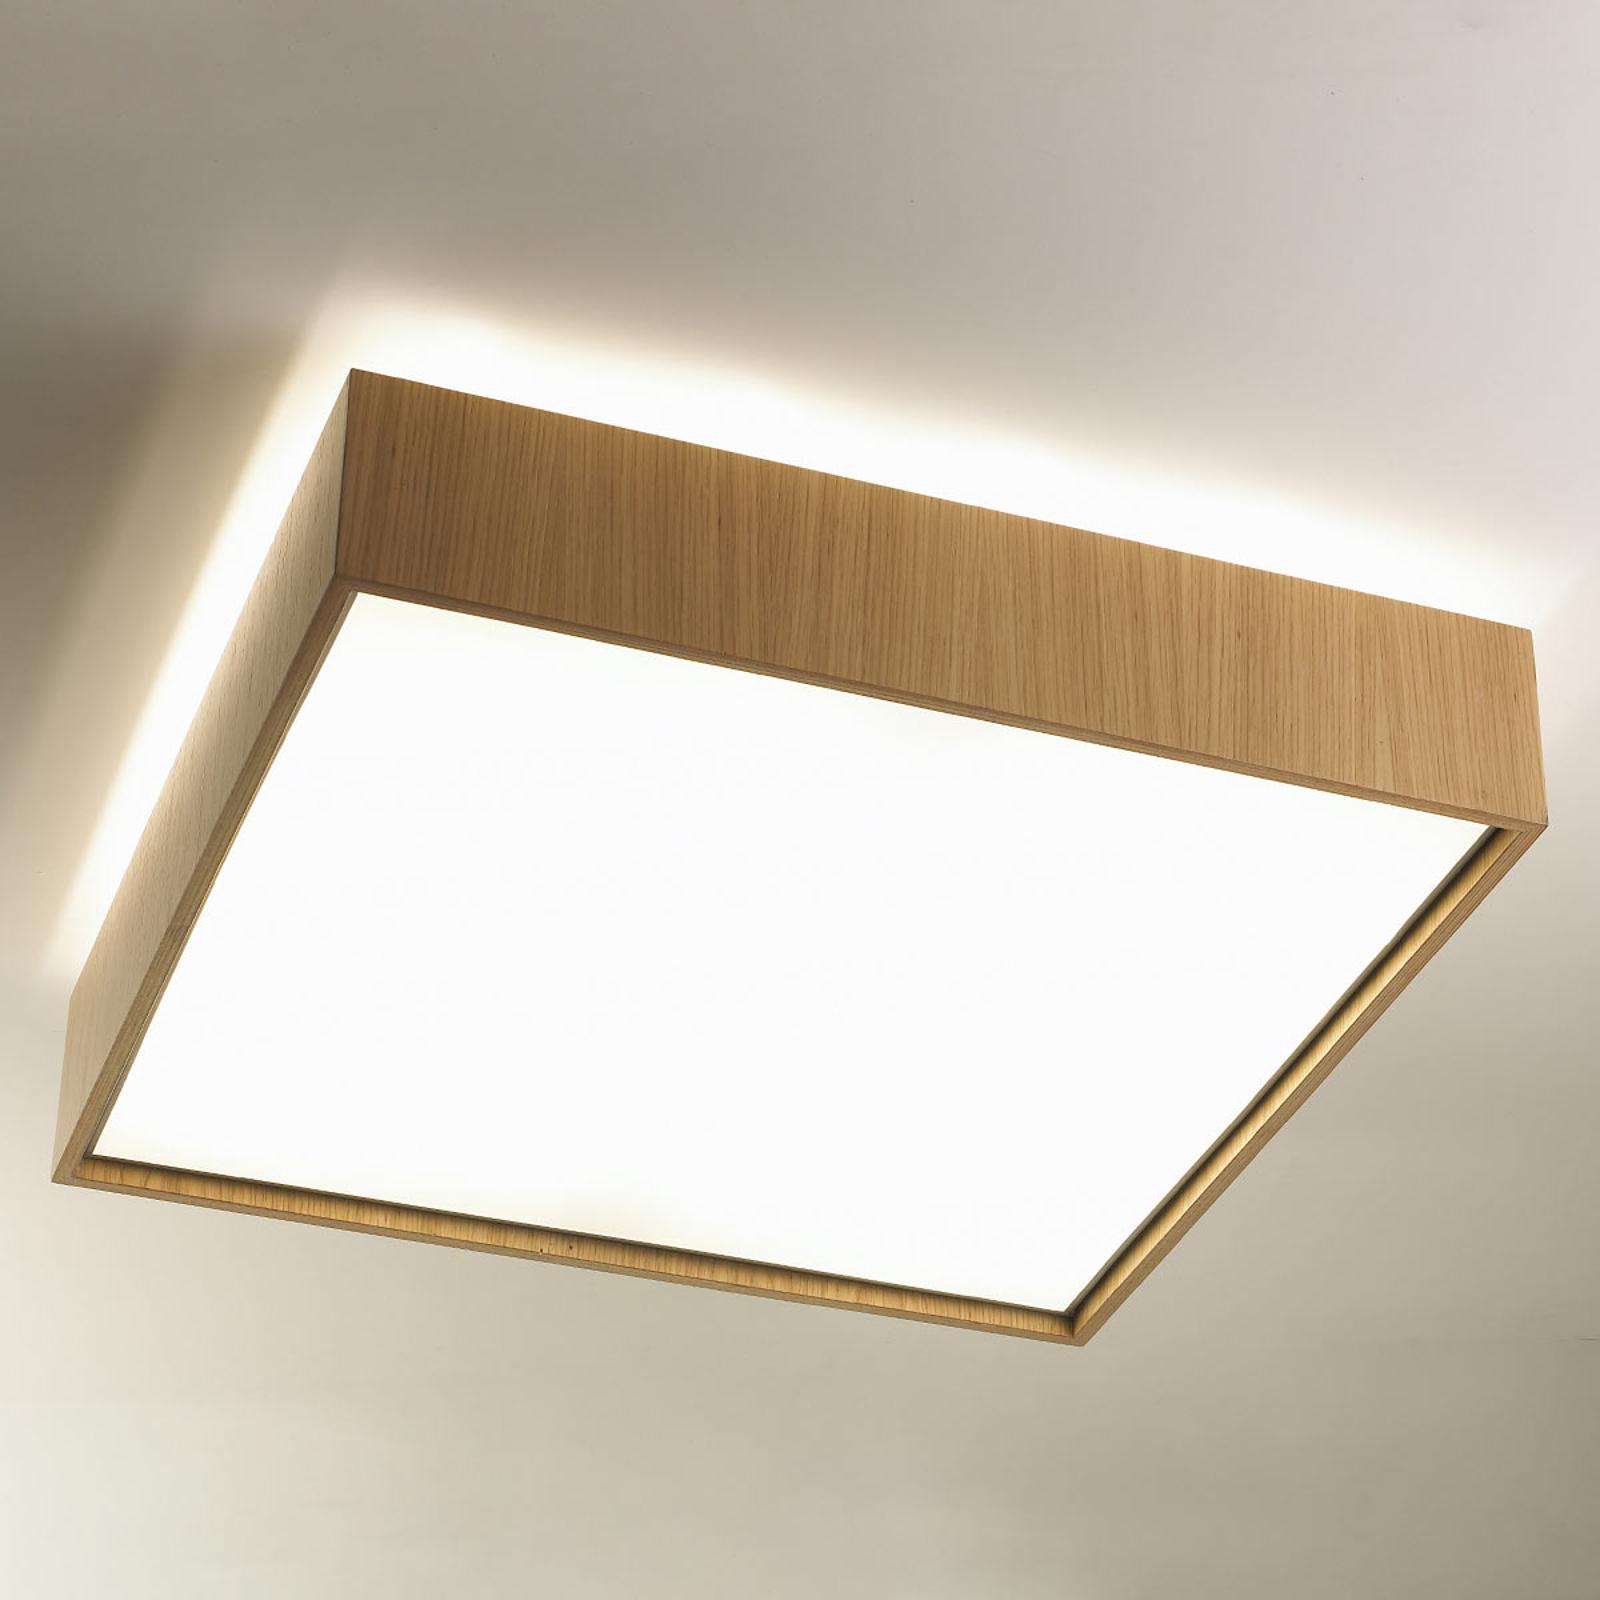 Taklampe Quadrat C med LED 60 x 60, eik